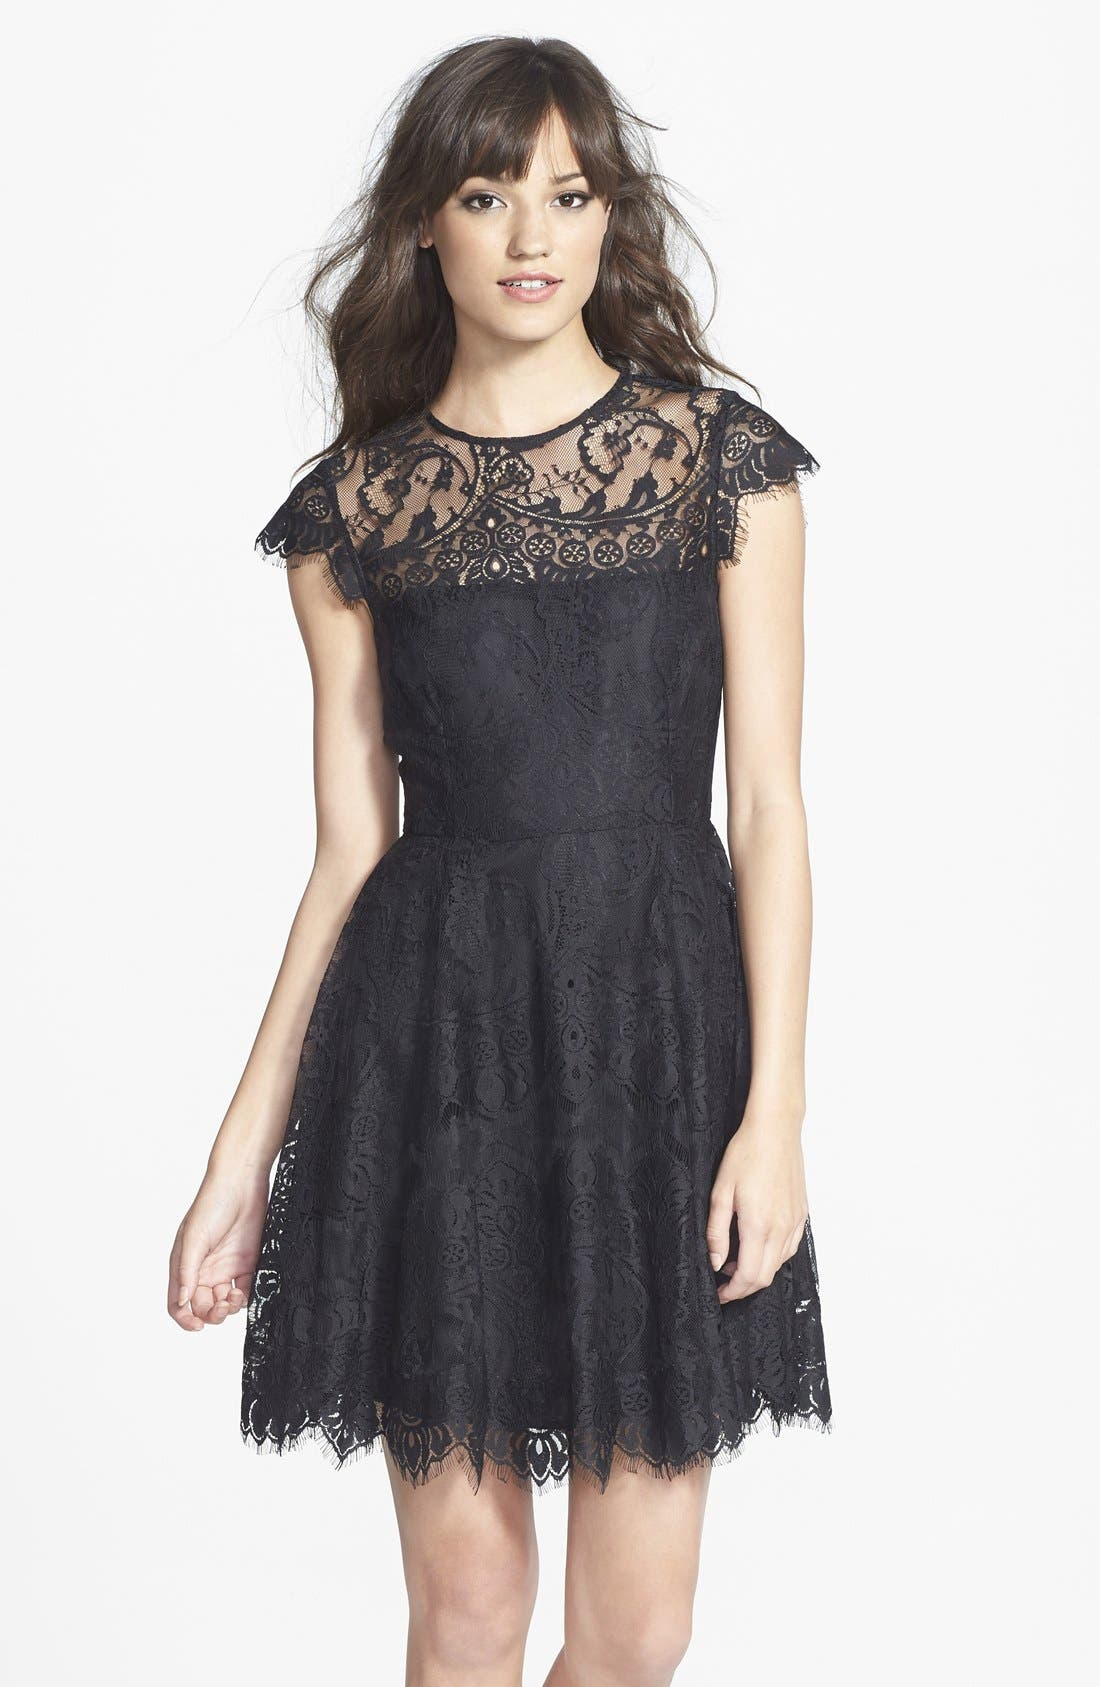 Alternate Image 1 Selected - BB Dakota 'Rhianna' Illusion Yoke Lace Fit & Flare Dress (Nordstrom Exclusive)